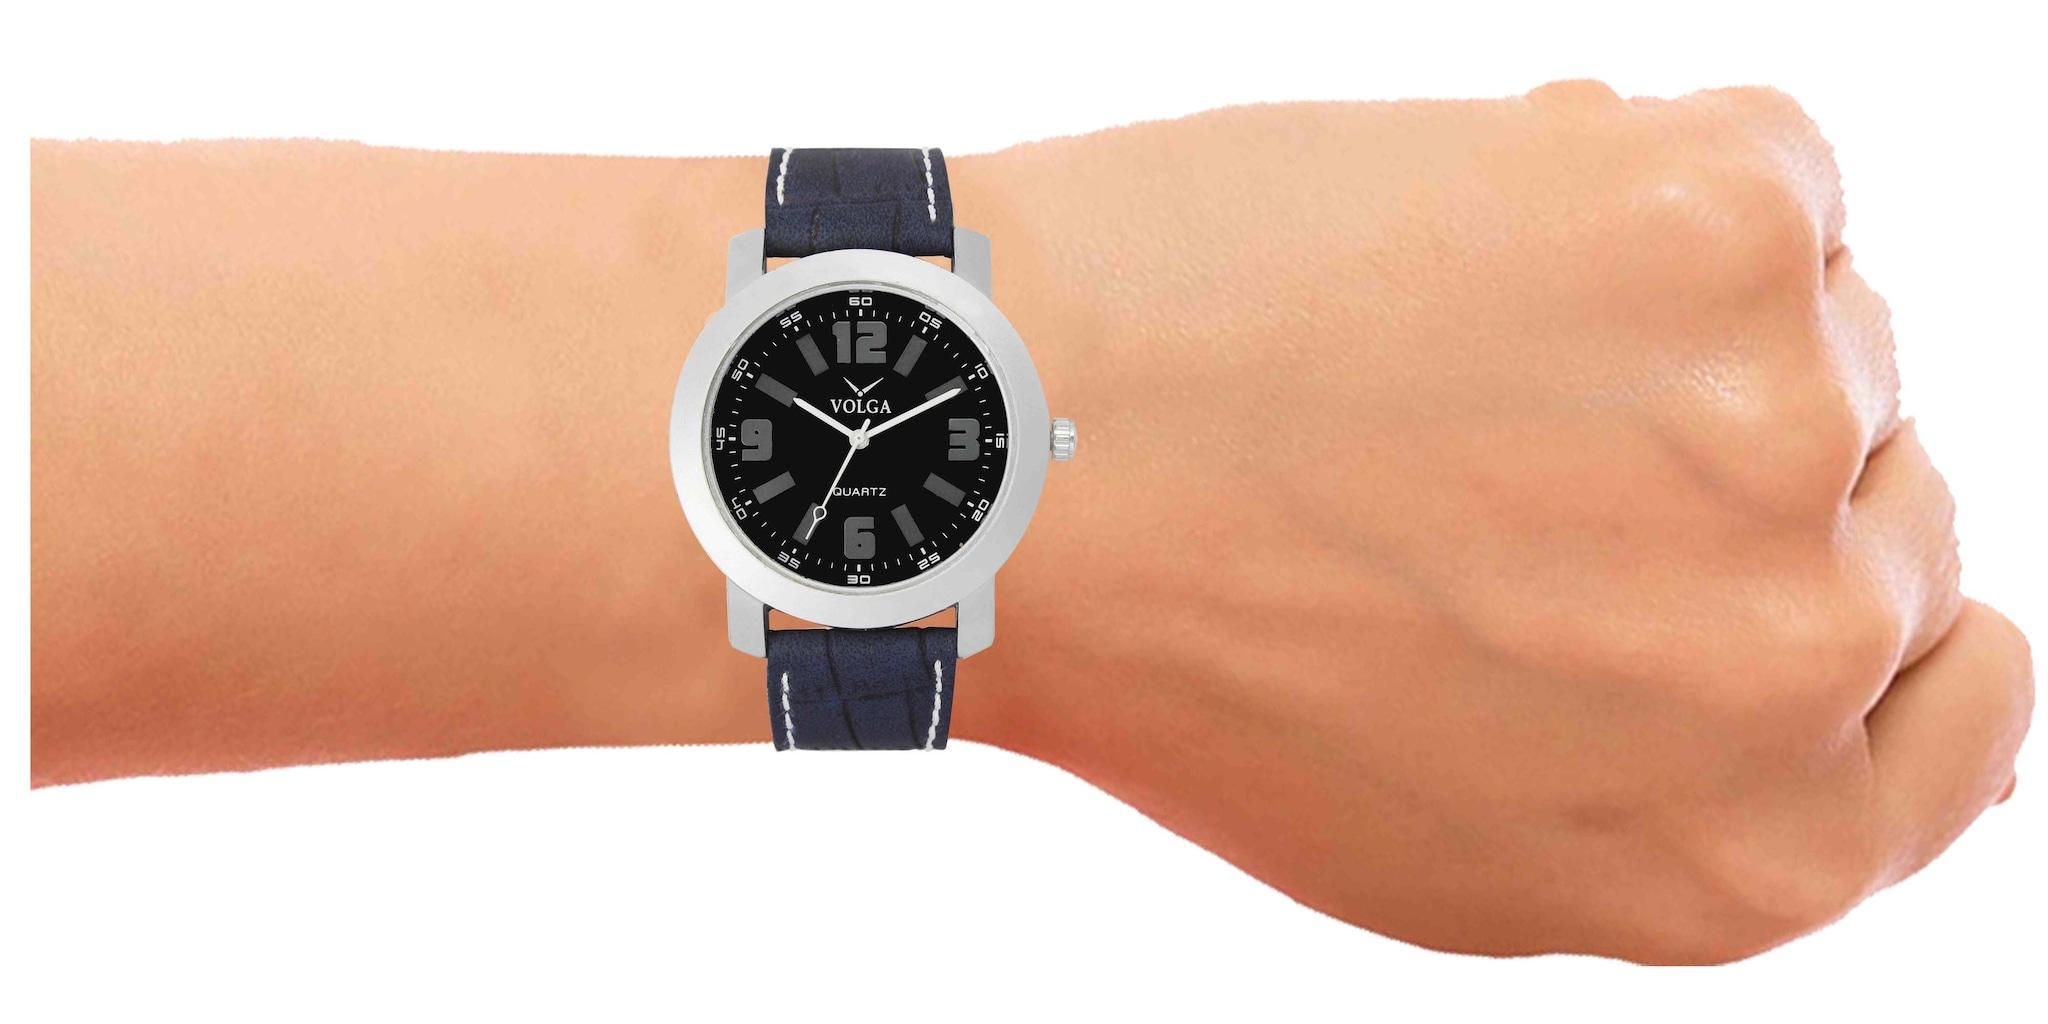 Volga New Arrival Analogue Sports Dial Men's Wrist Watch